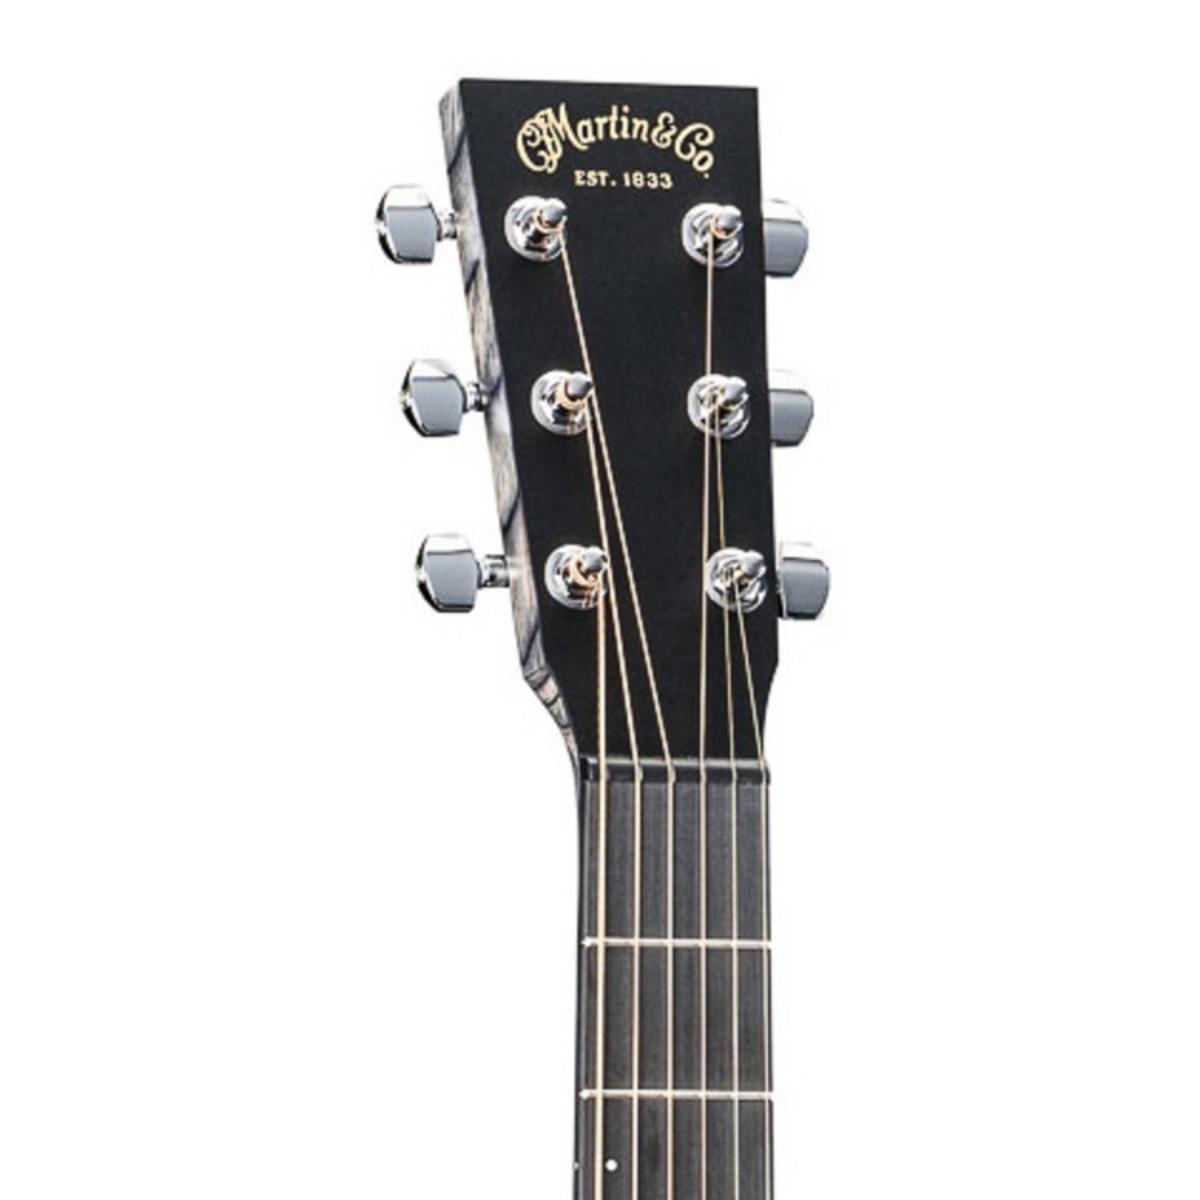 martin omcpa5 guitare lectro acoustique noir. Black Bedroom Furniture Sets. Home Design Ideas